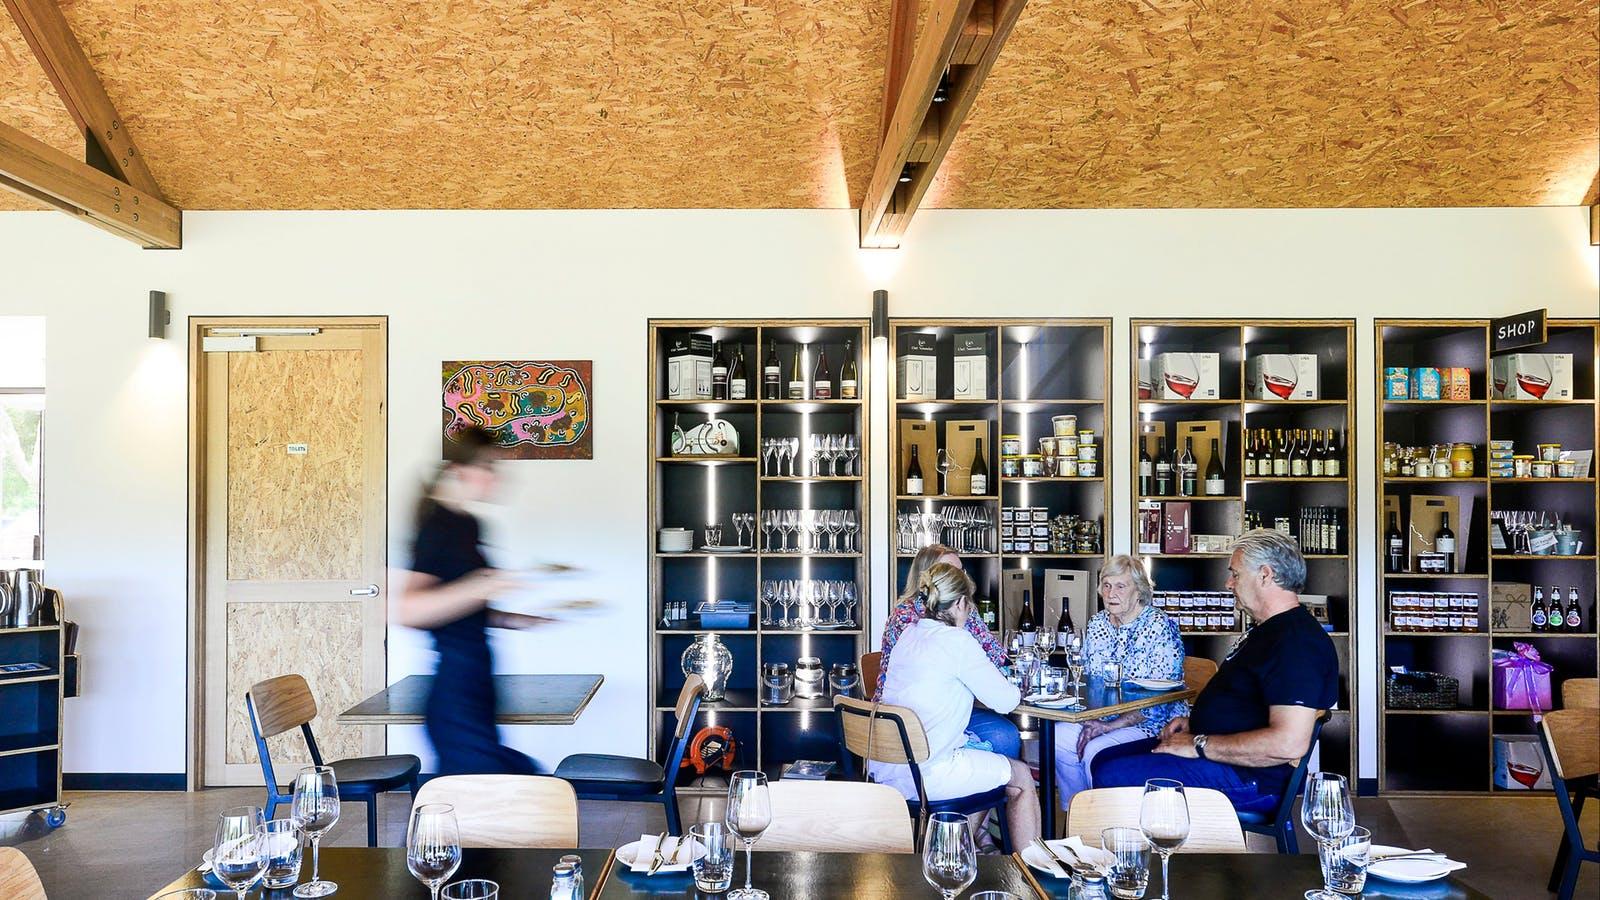 Restaurant interior and shop